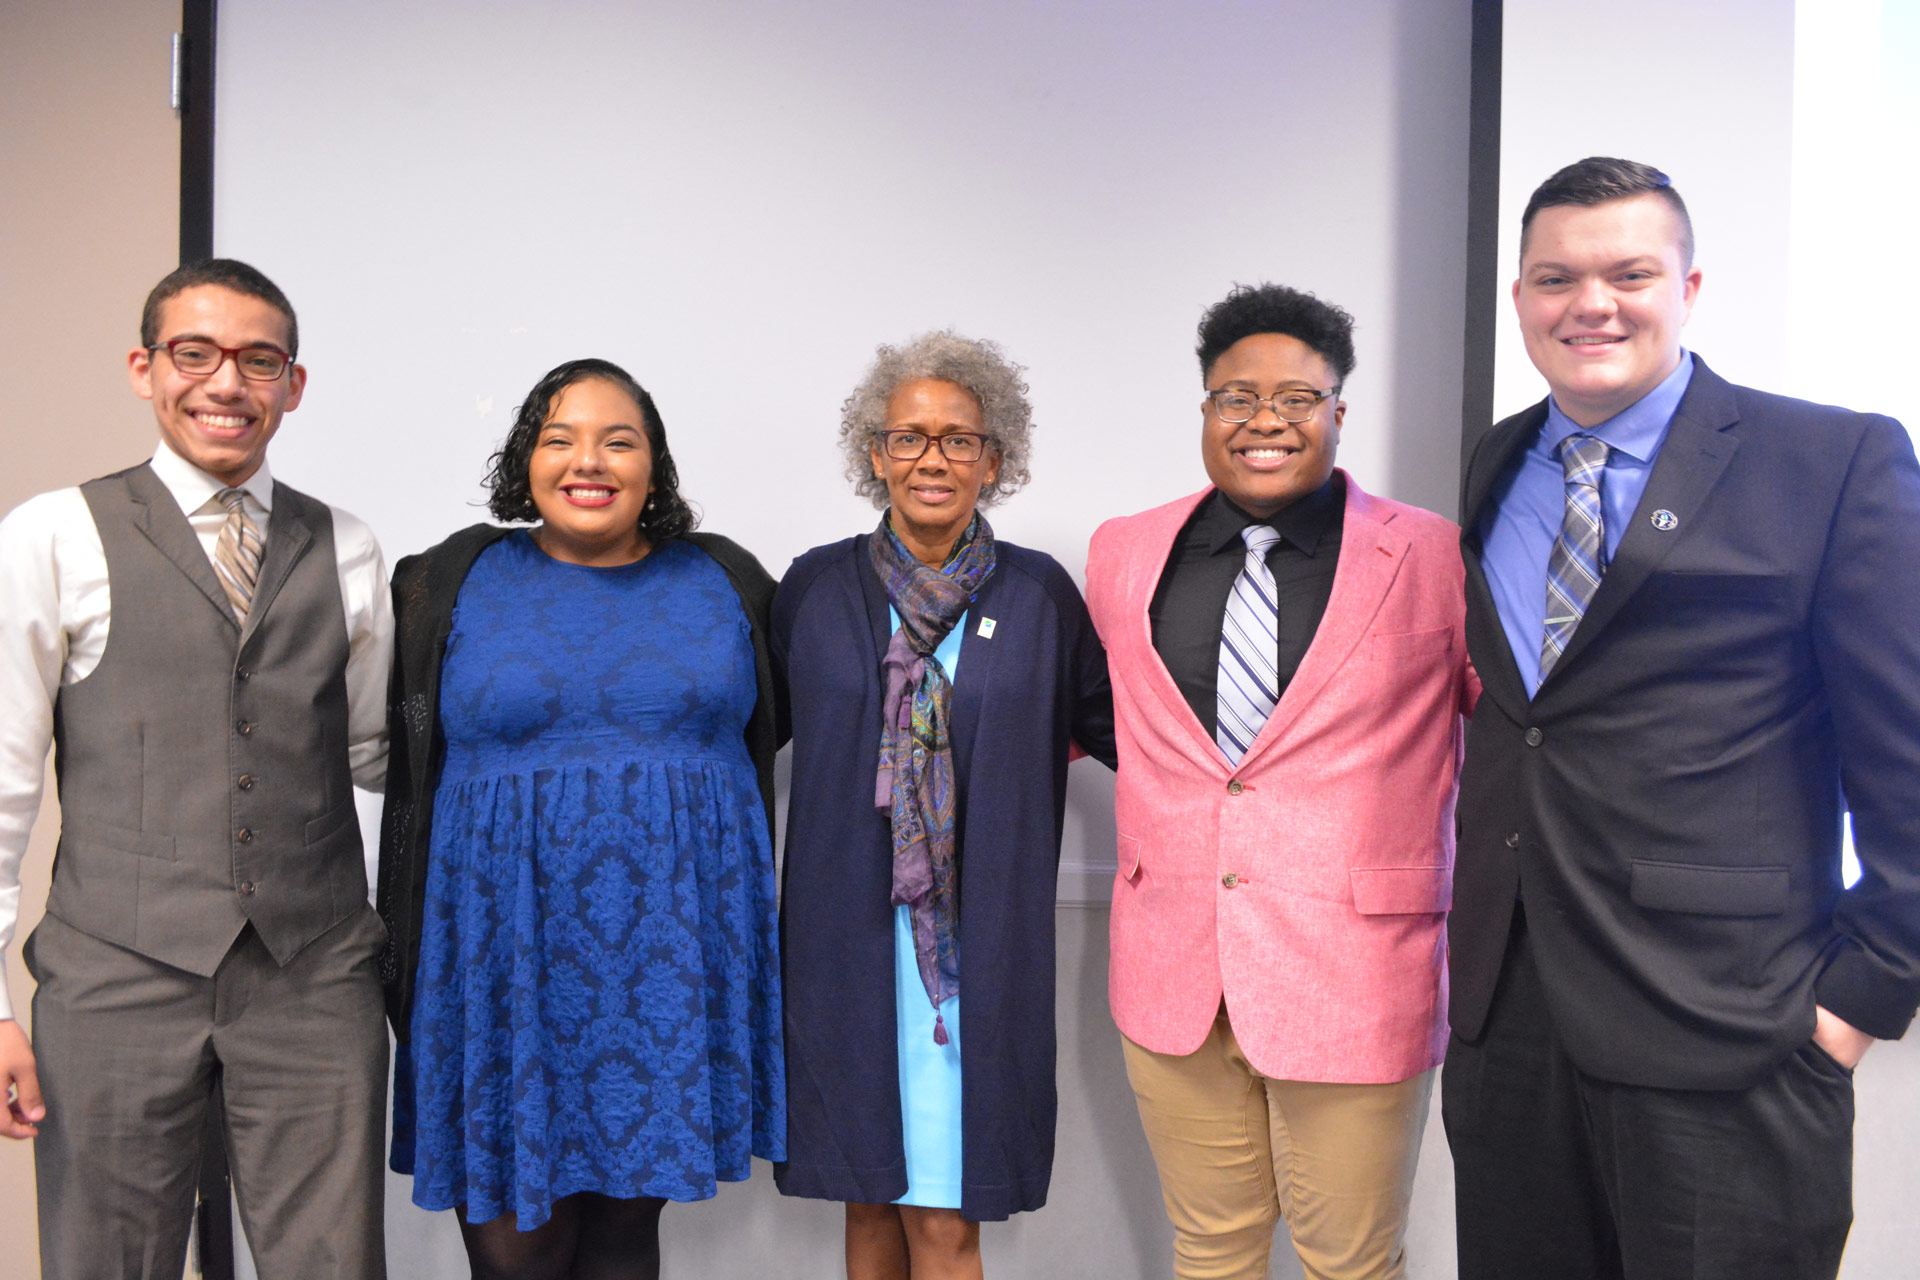 UHCL President Blake visits student leaders